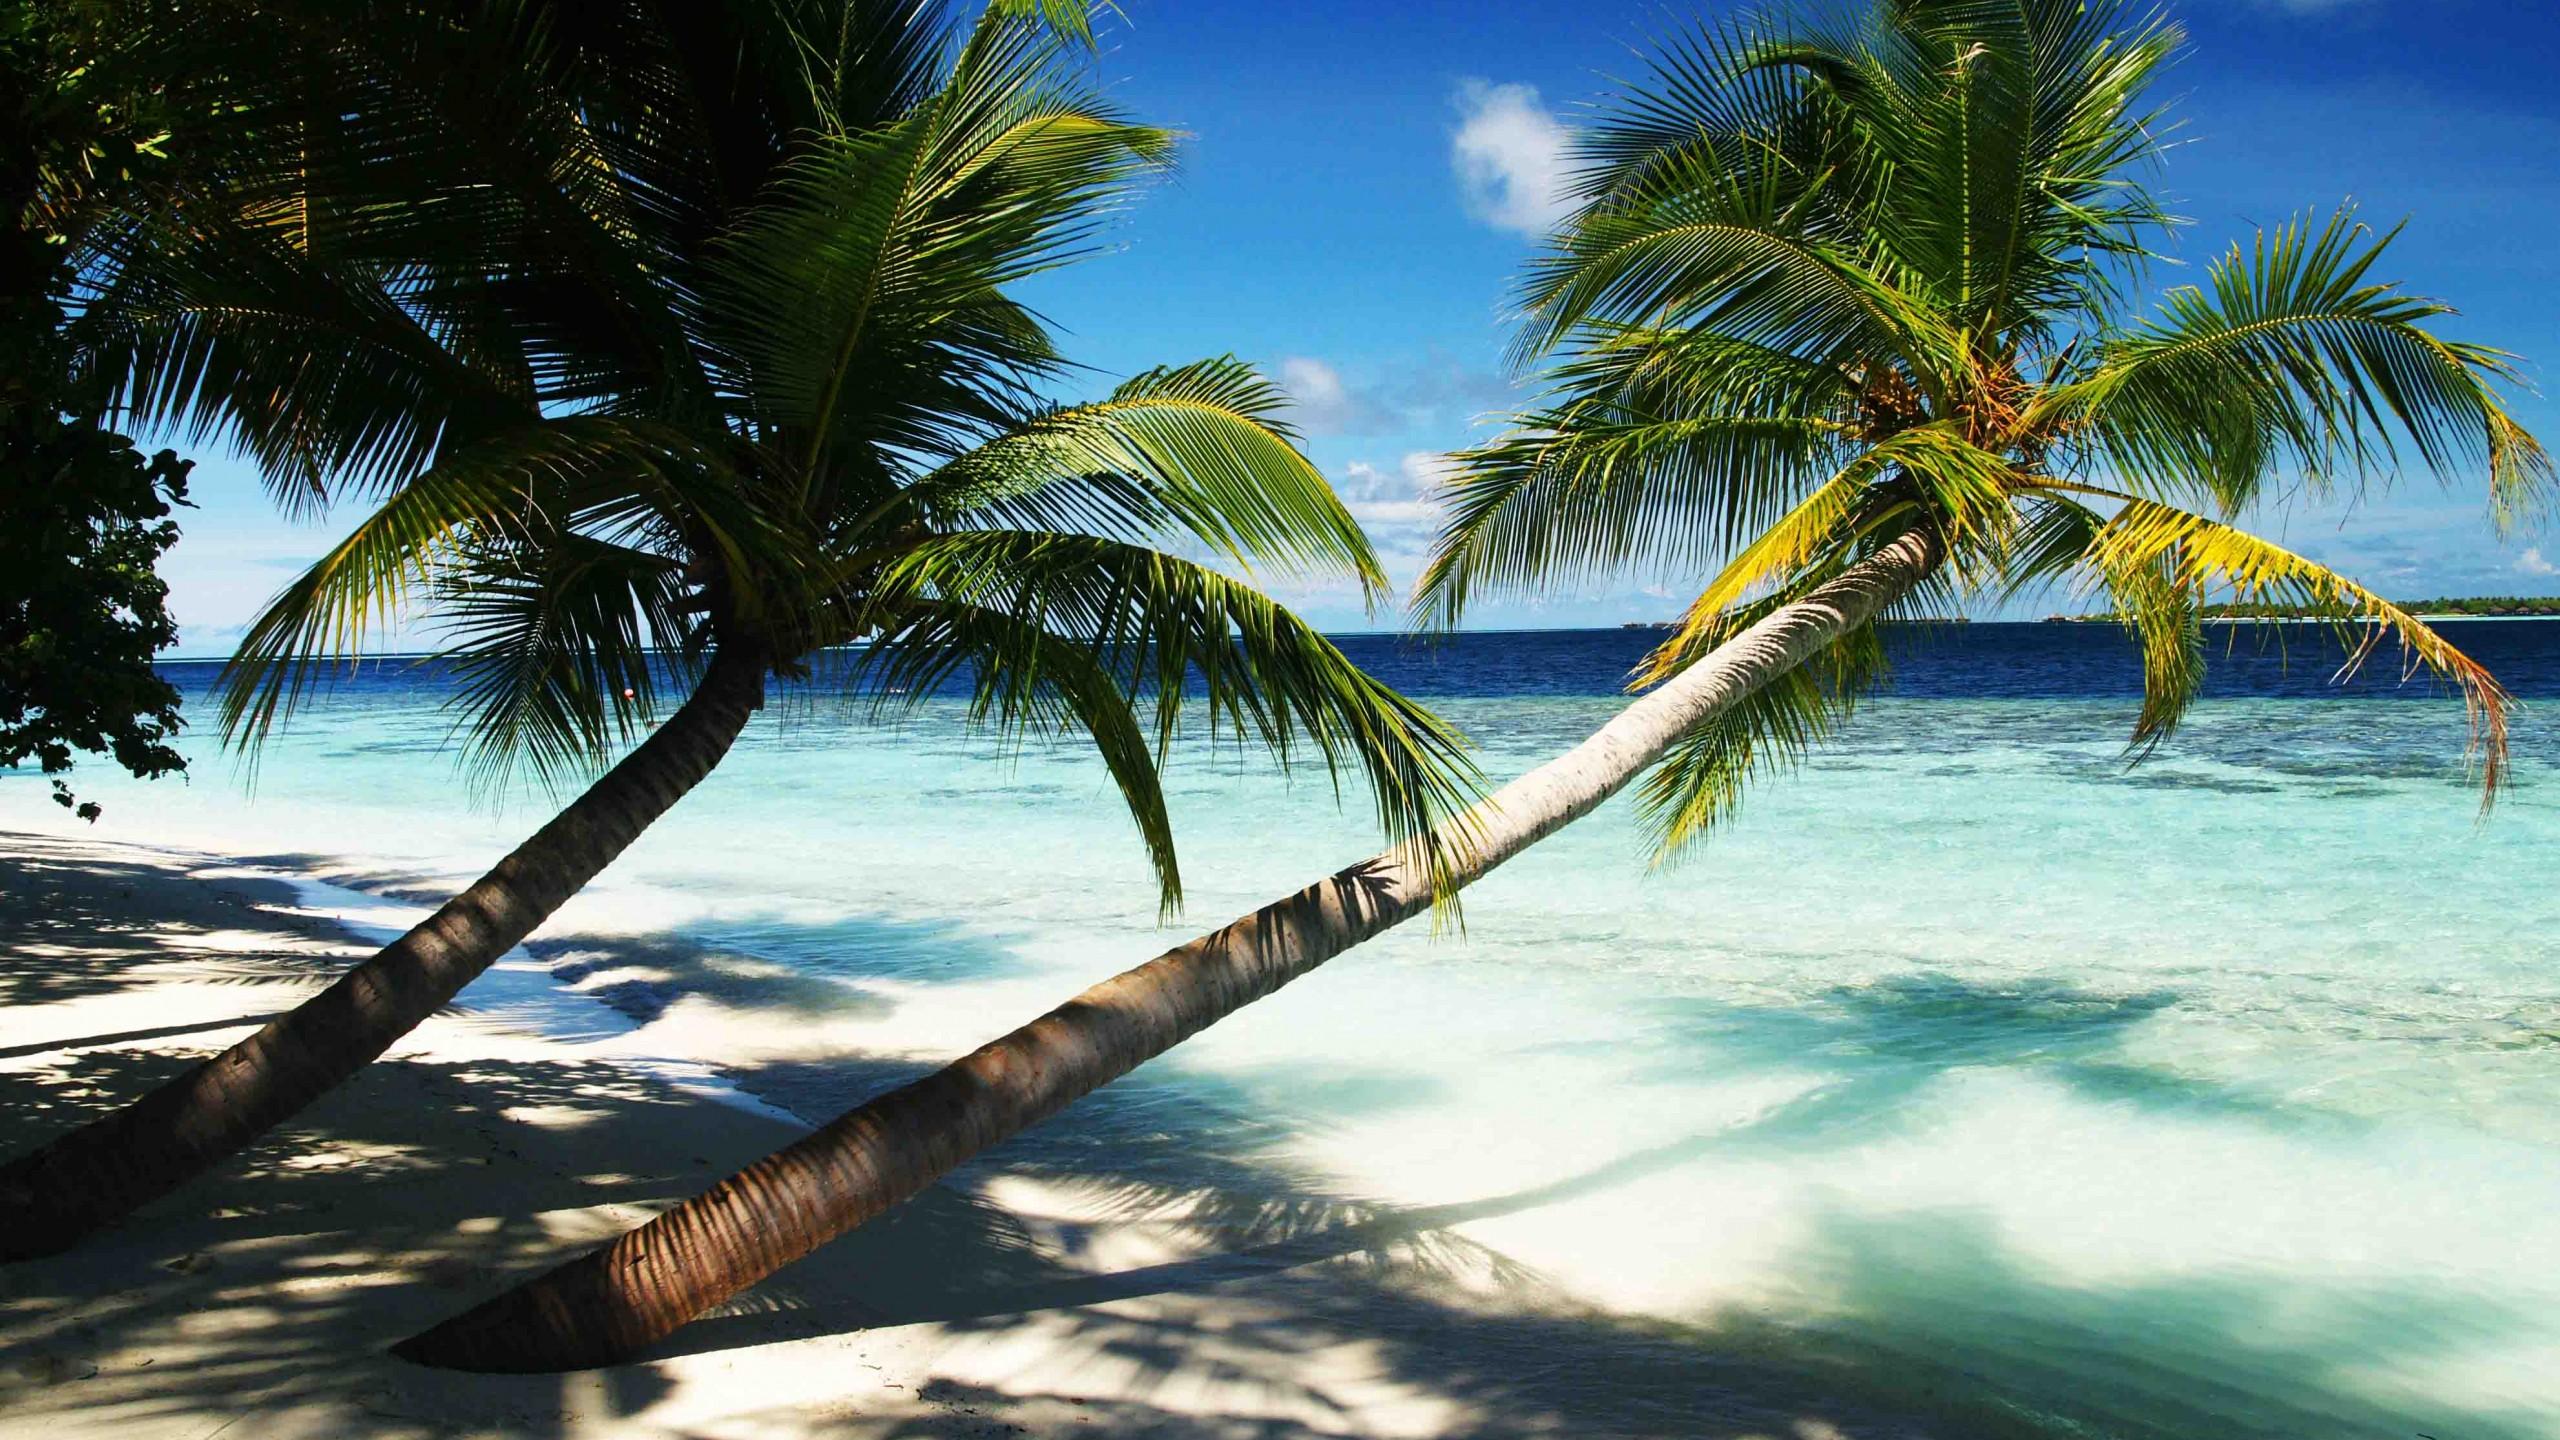 Wallpaper Maldives, 4k, 5k Wallpaper, Holidays, Palms